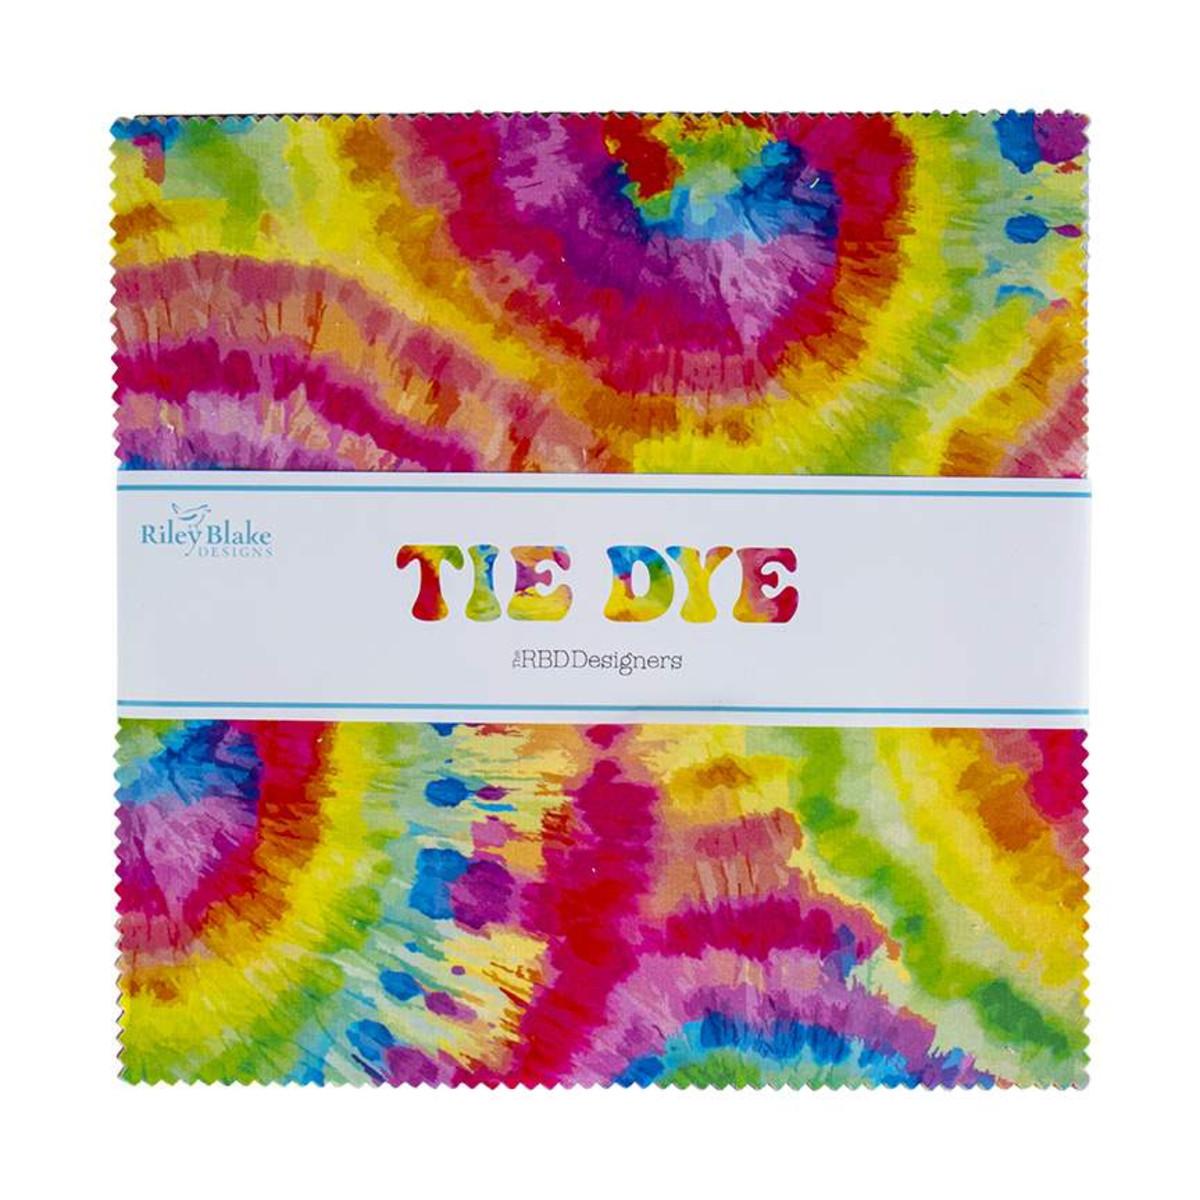 Riley Blake Layer Cake - Tie Dye by The RBD Designers